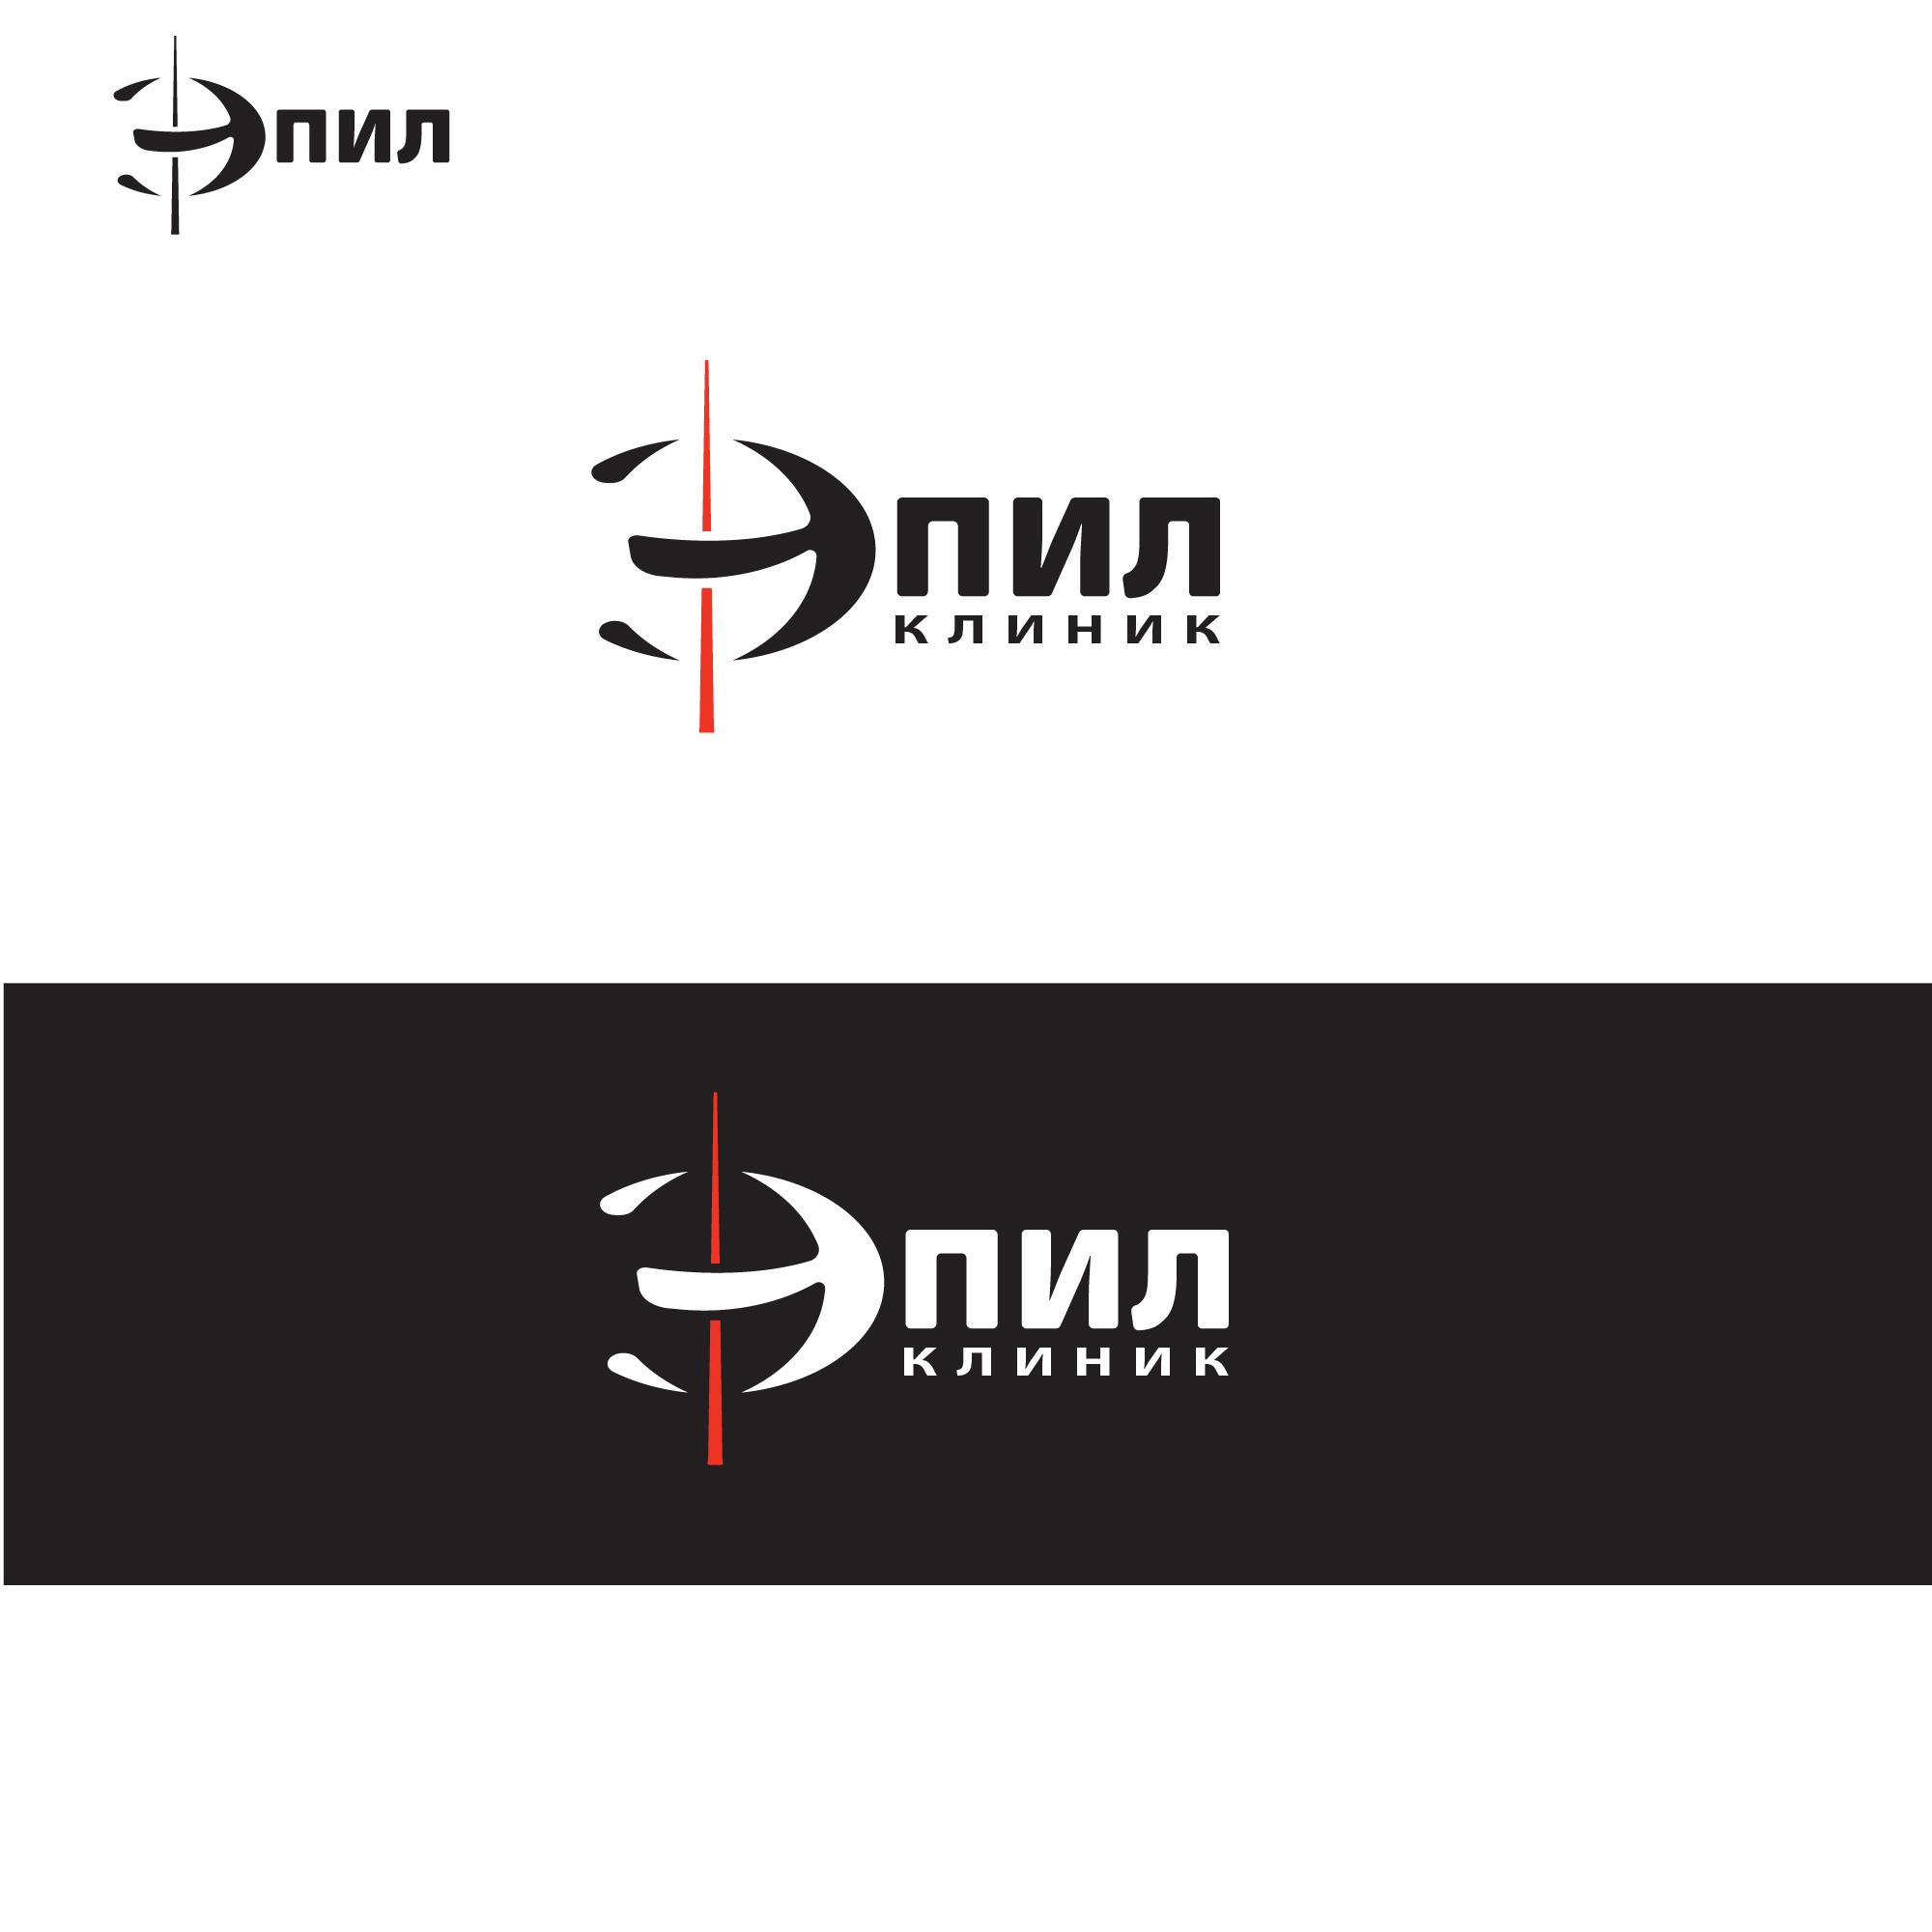 Логотип , фирменный стиль  фото f_2735e18e22fb9b20.jpg